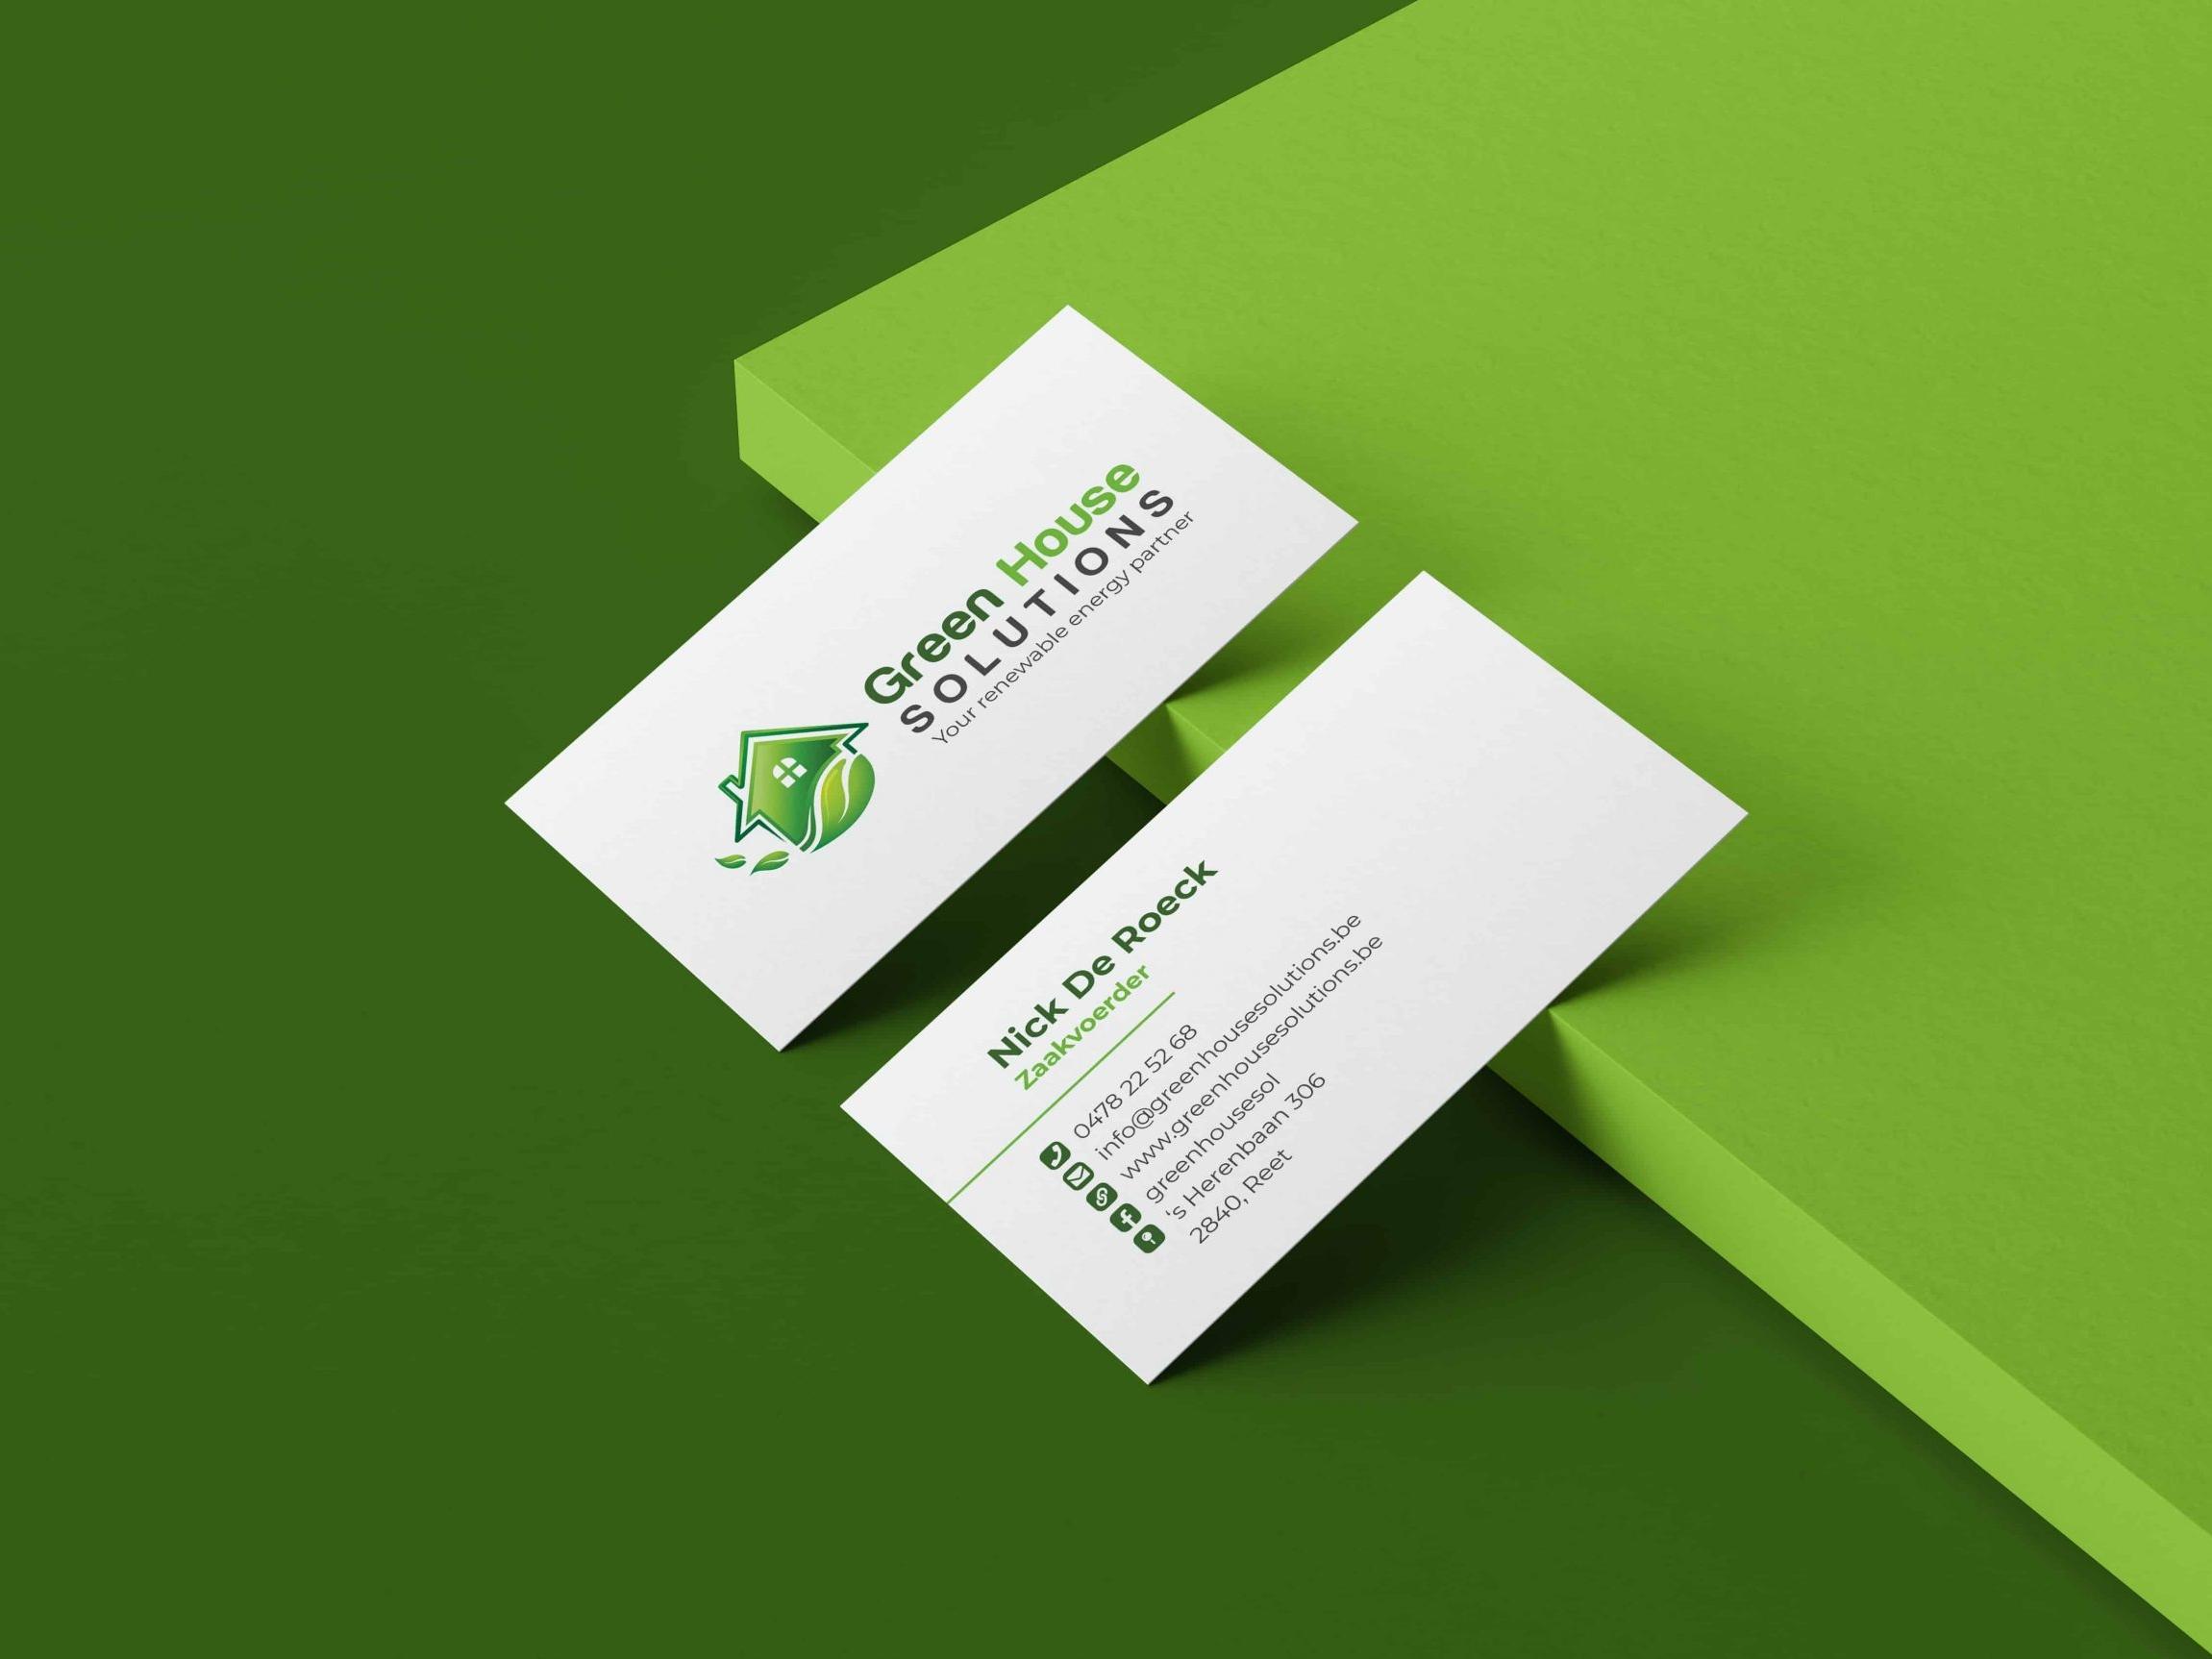 Larkom portfolio Green House Solutions 00002 1 scaled